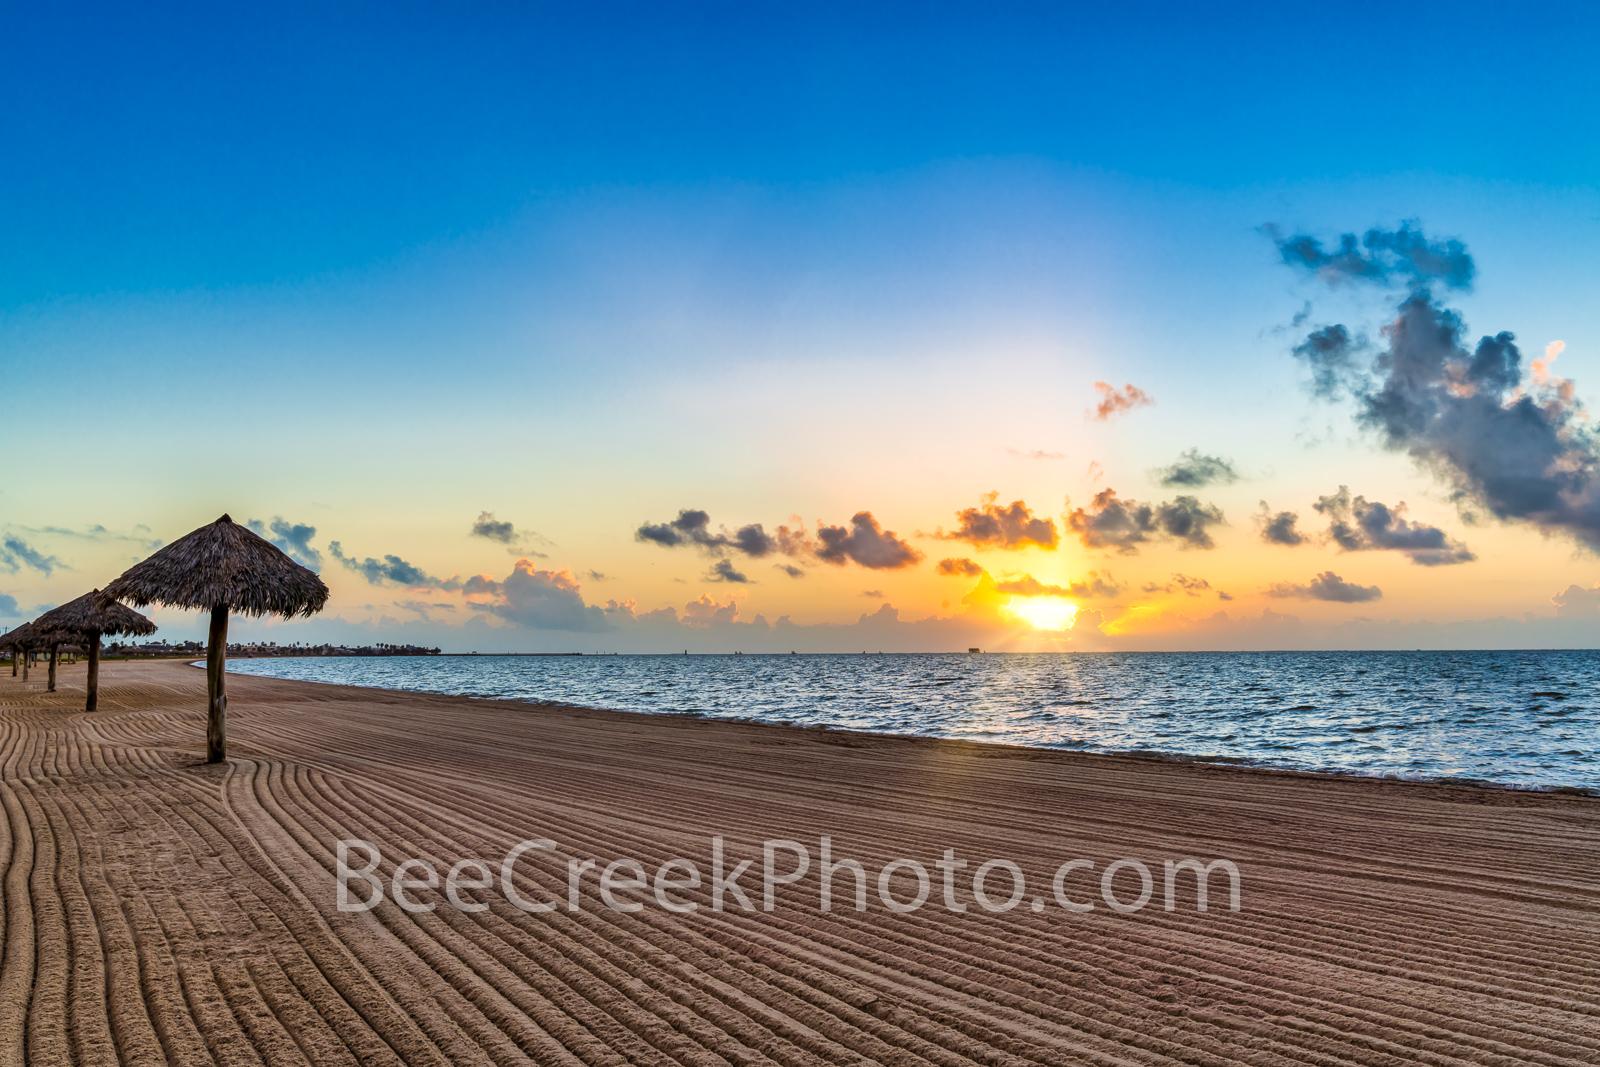 rockport, texas, beach, sunrise, glow, sandy beach, beach, clouds, orange, pink, rockport texas, ocean, gulf of mexico, gulf, texas coast, texas gulf, water, seascape, waterscape, coastal, coast, sea,, photo